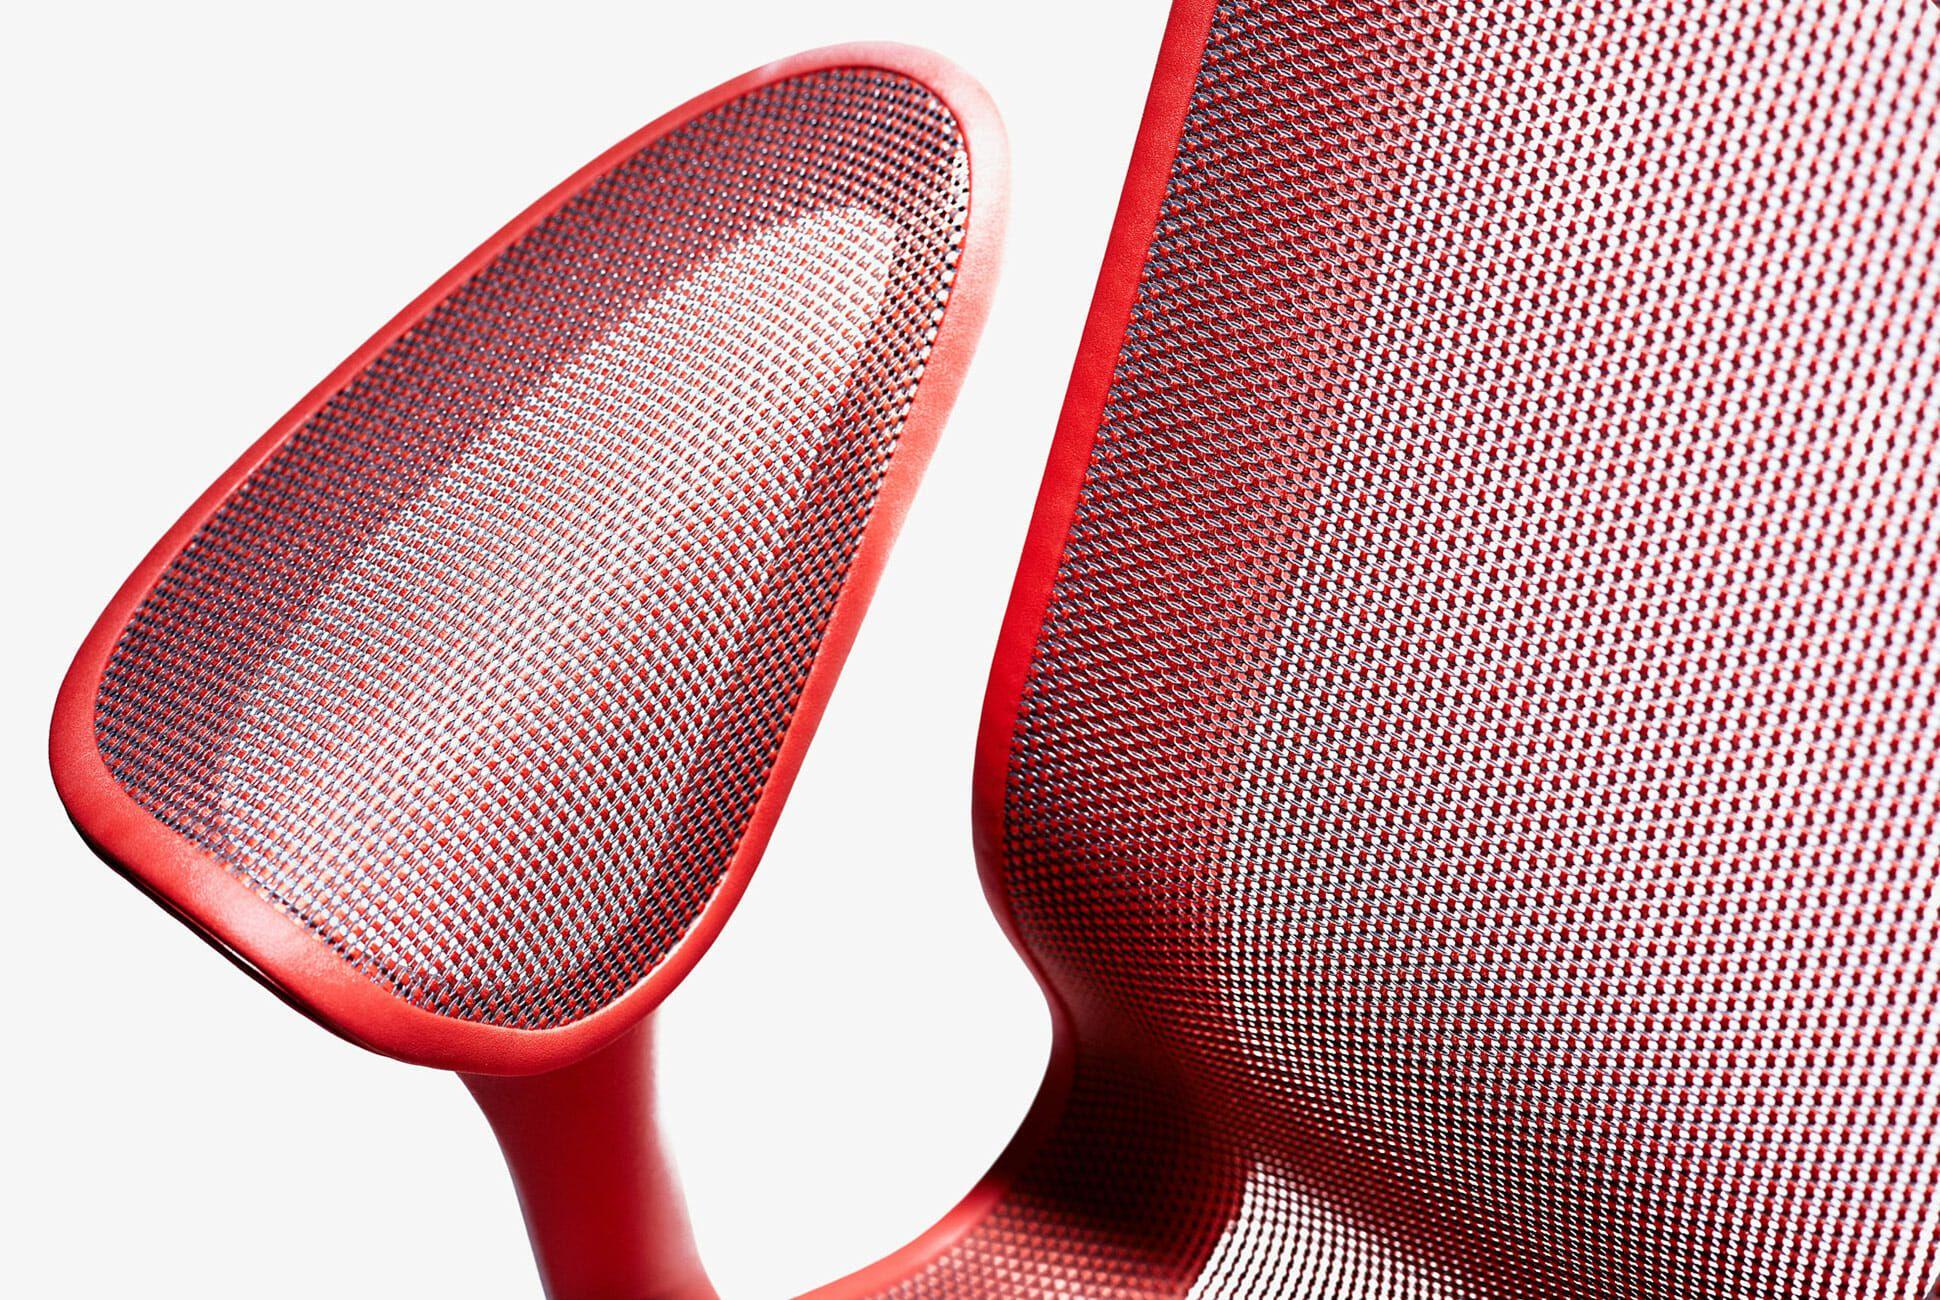 M2W-Cosm-Chair-Gear-Patrol-Slide-3